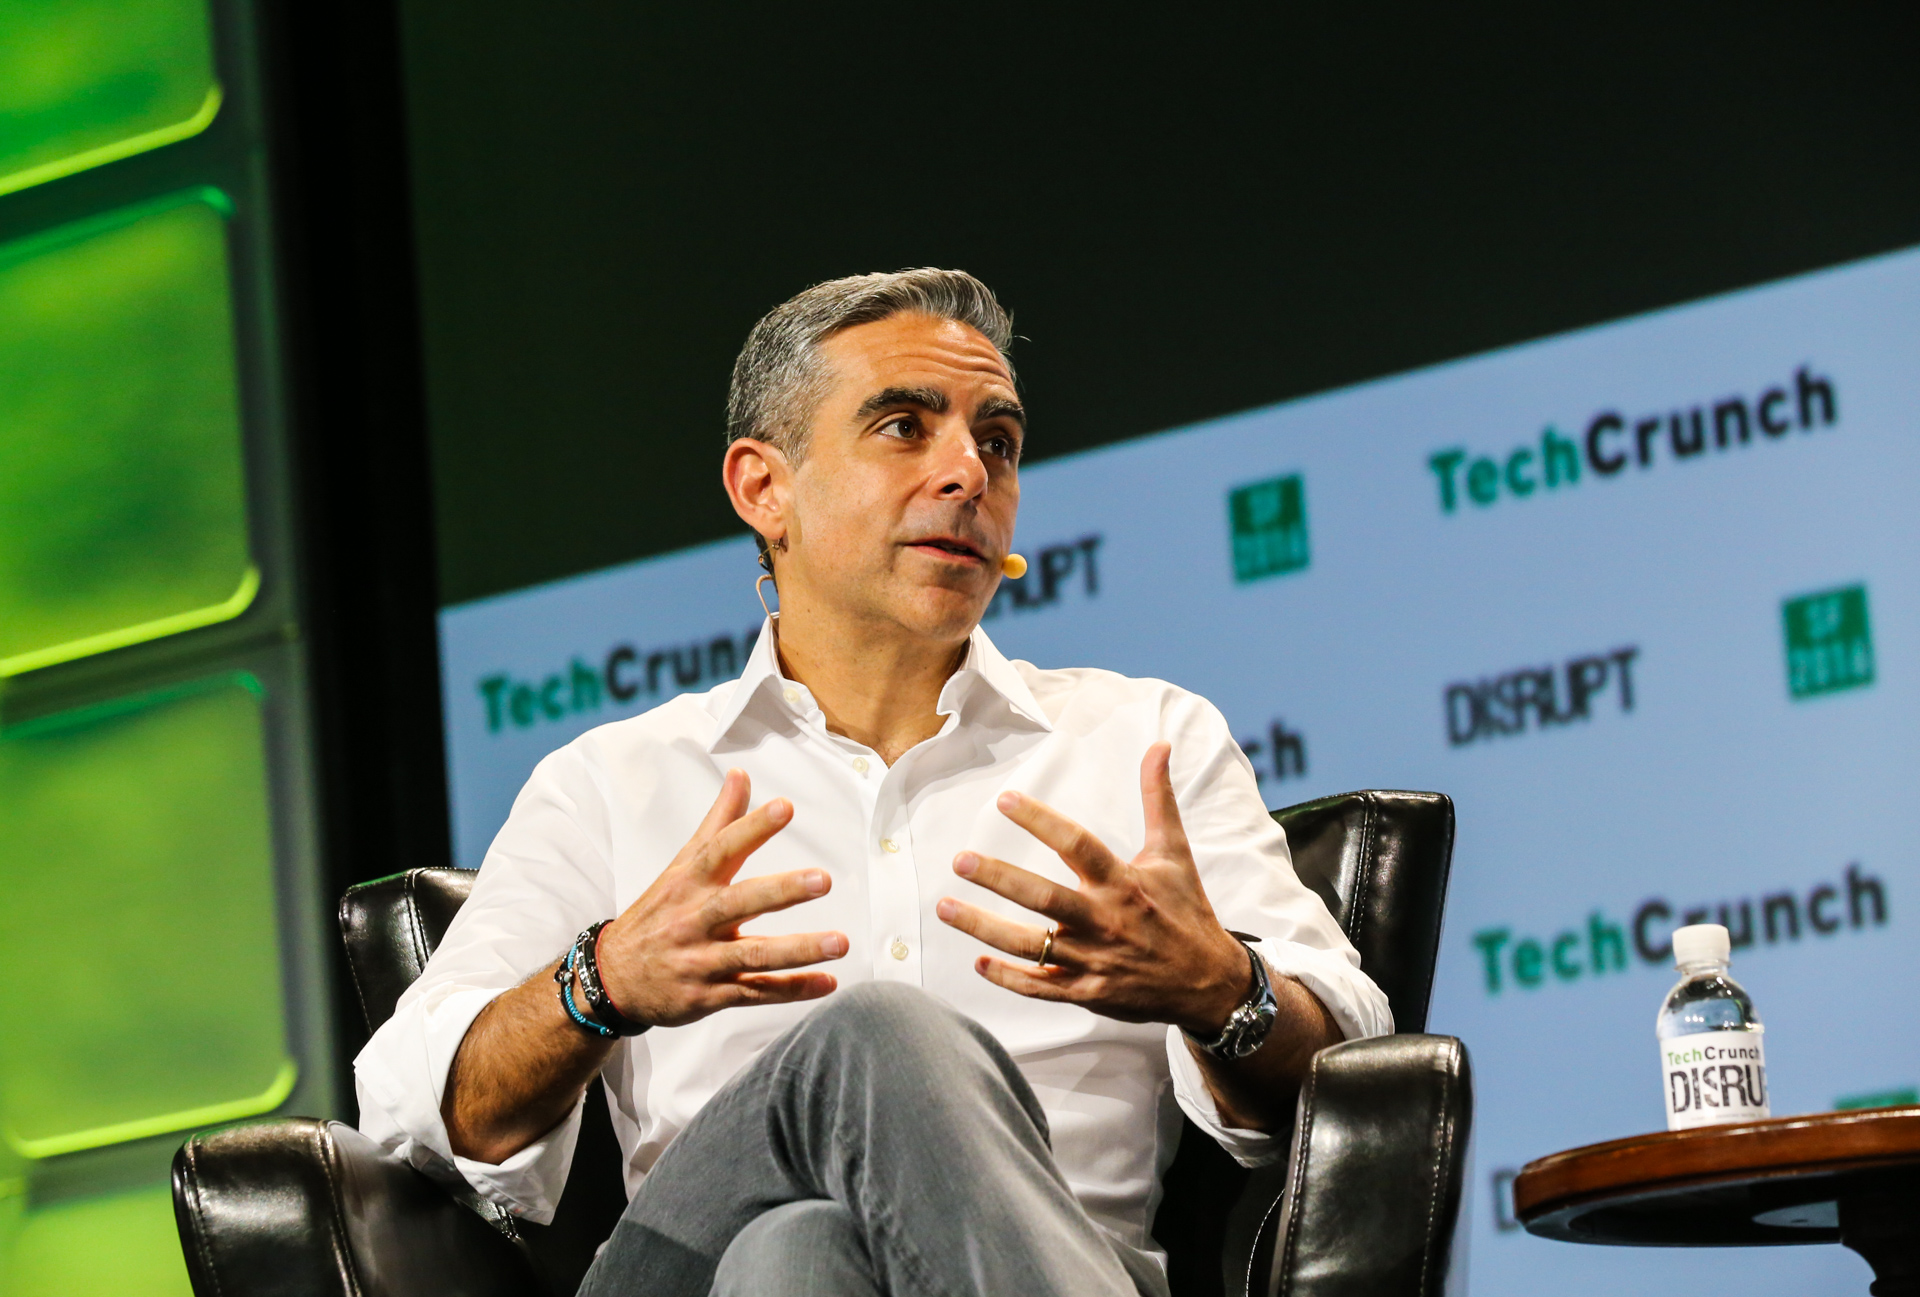 Facebook Messaging VP David Marcus joins Coinbase board